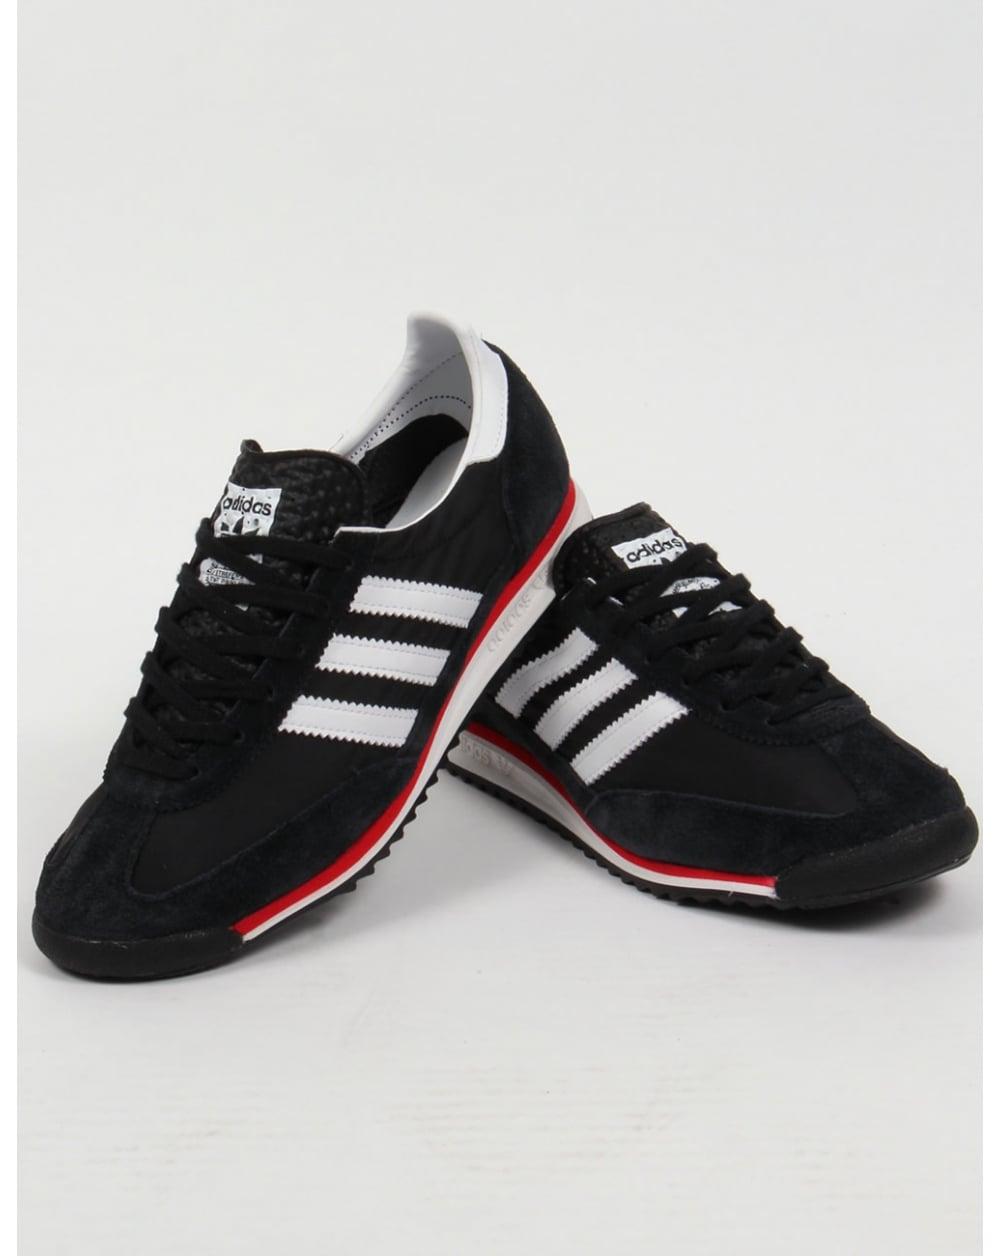 Adidas Sl 72 Trainers Black/white/red,originals,shoes ...